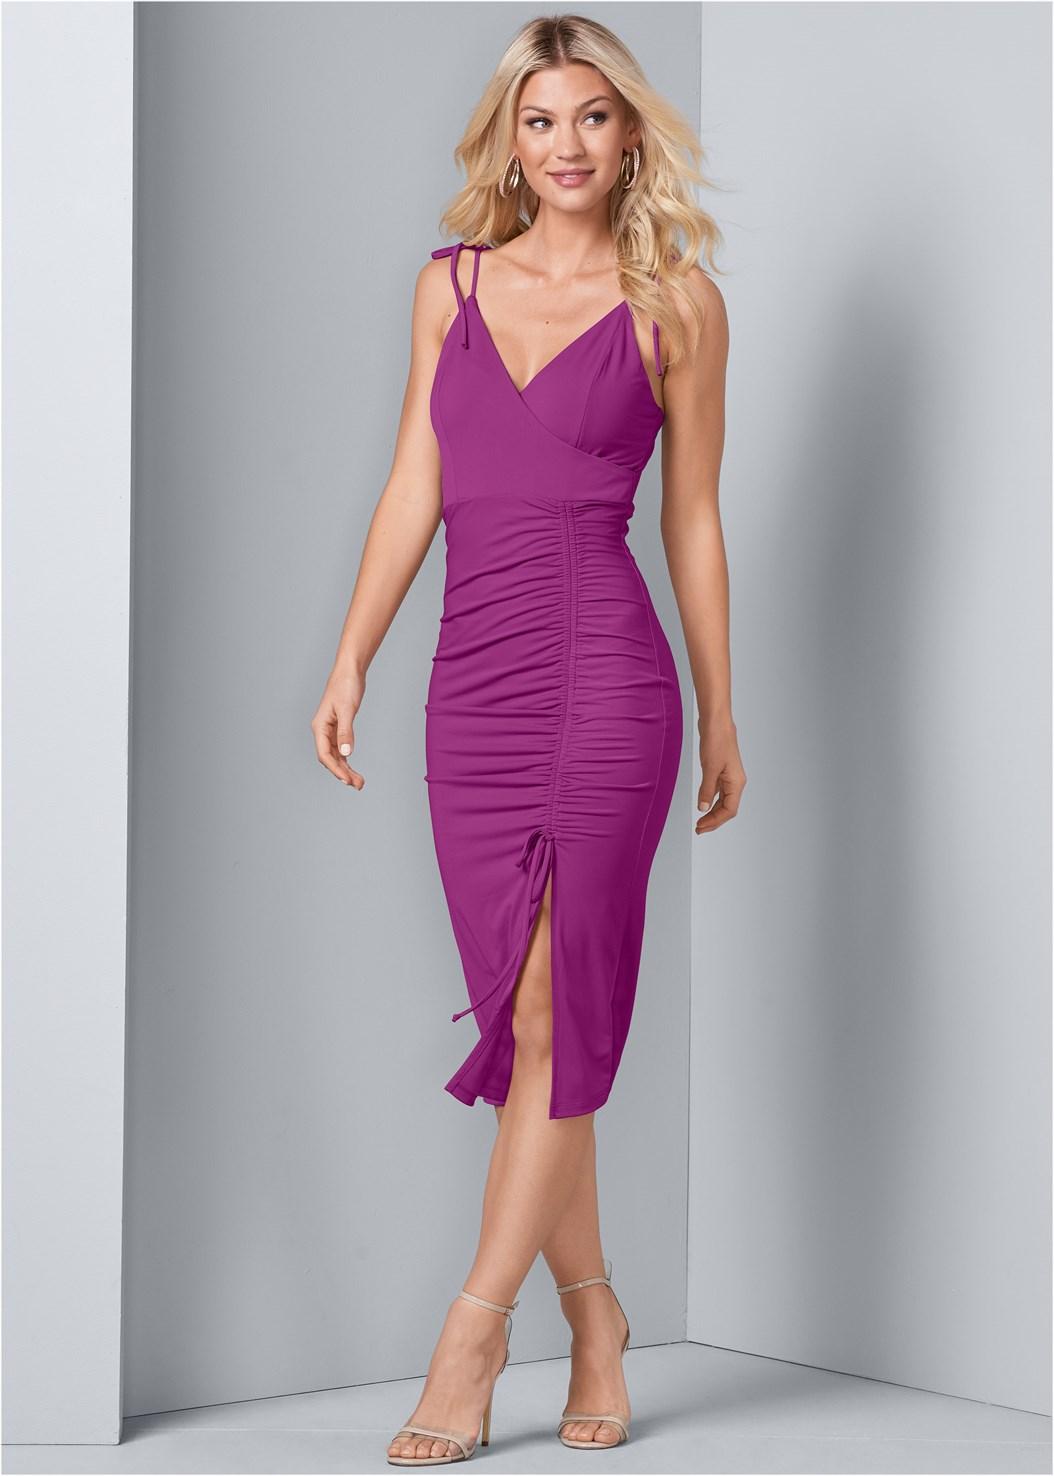 Ruched Detail Dress,Venus Cupid Bra,Lucite Detail Heels